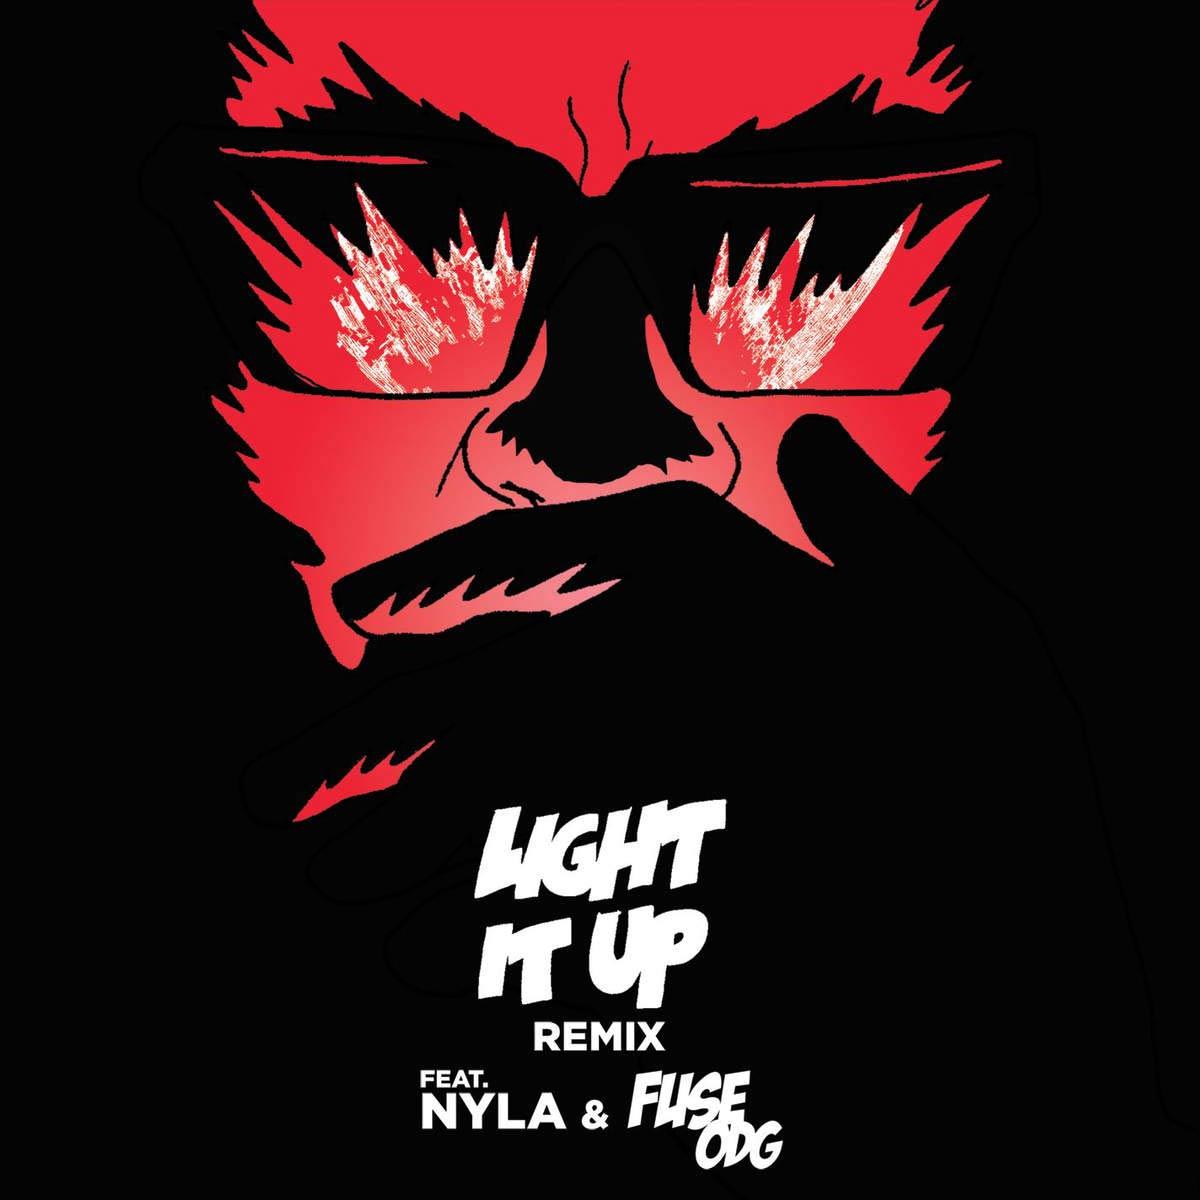 light it up cancion: